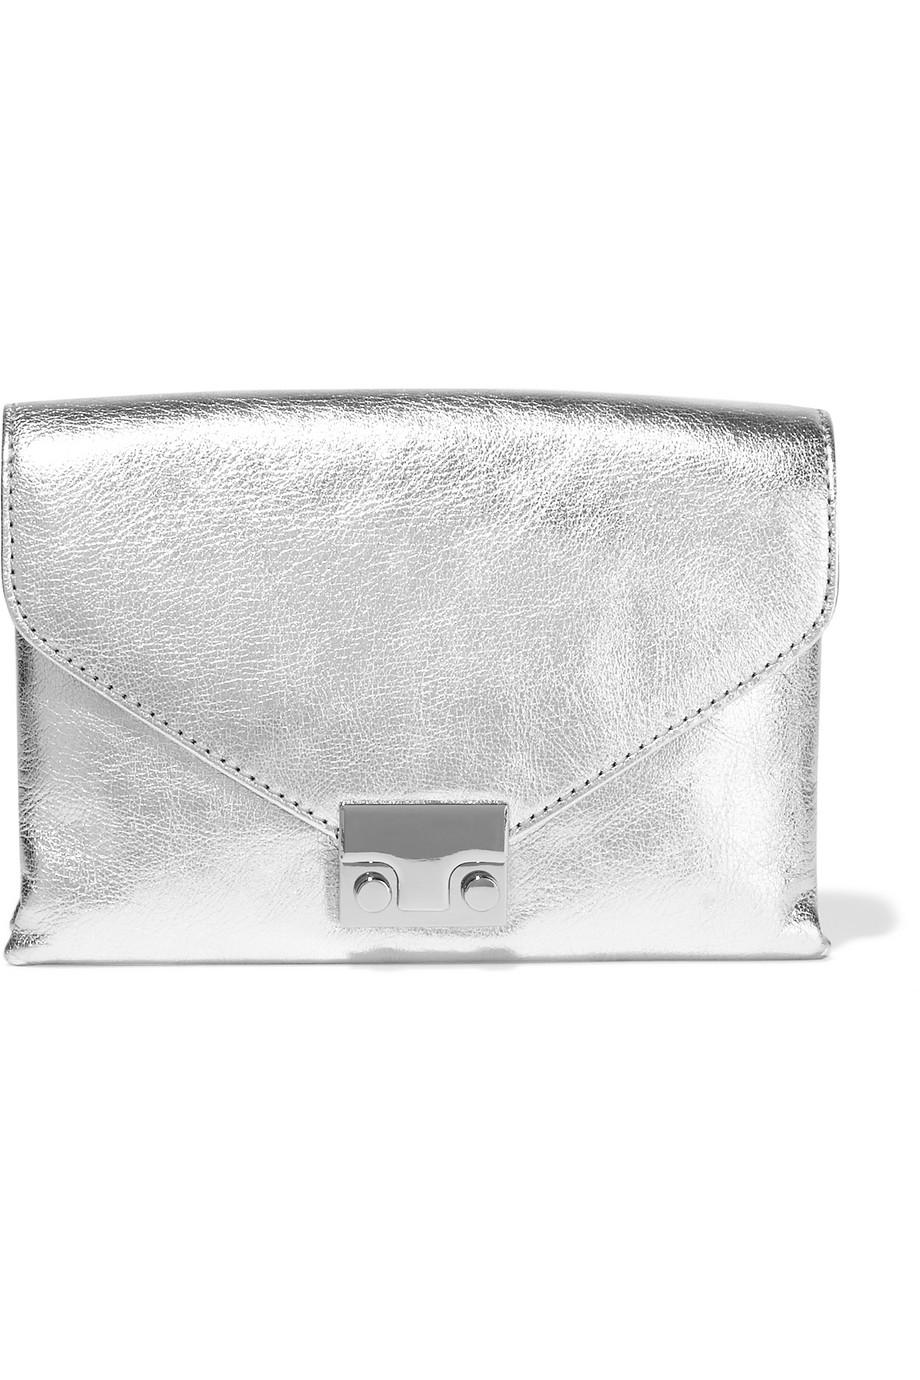 Metallic Textured-Leather Clutch, Silver, Women's